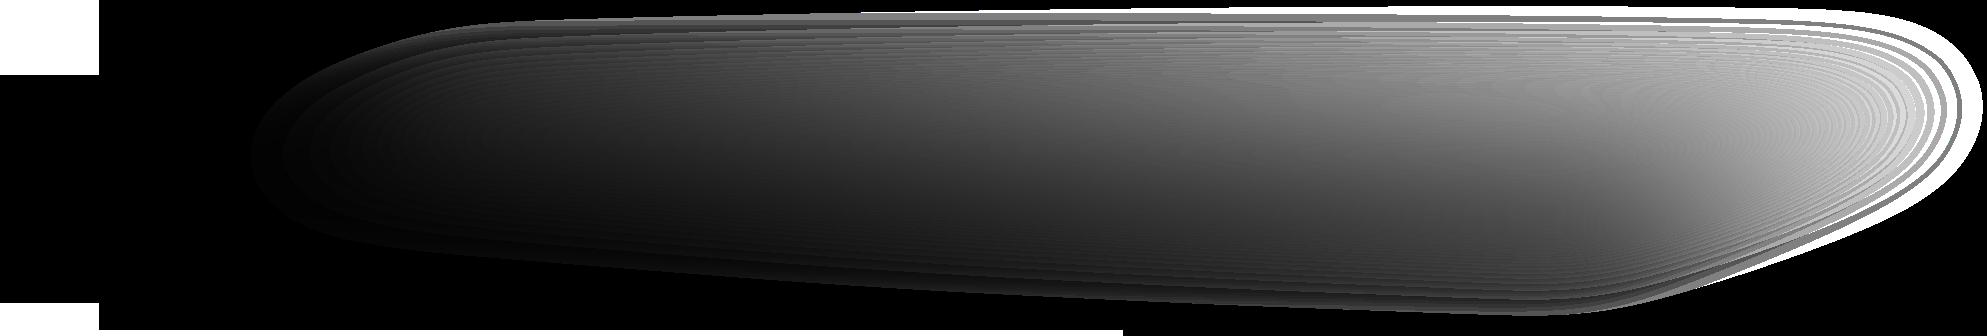 Computer Shadow